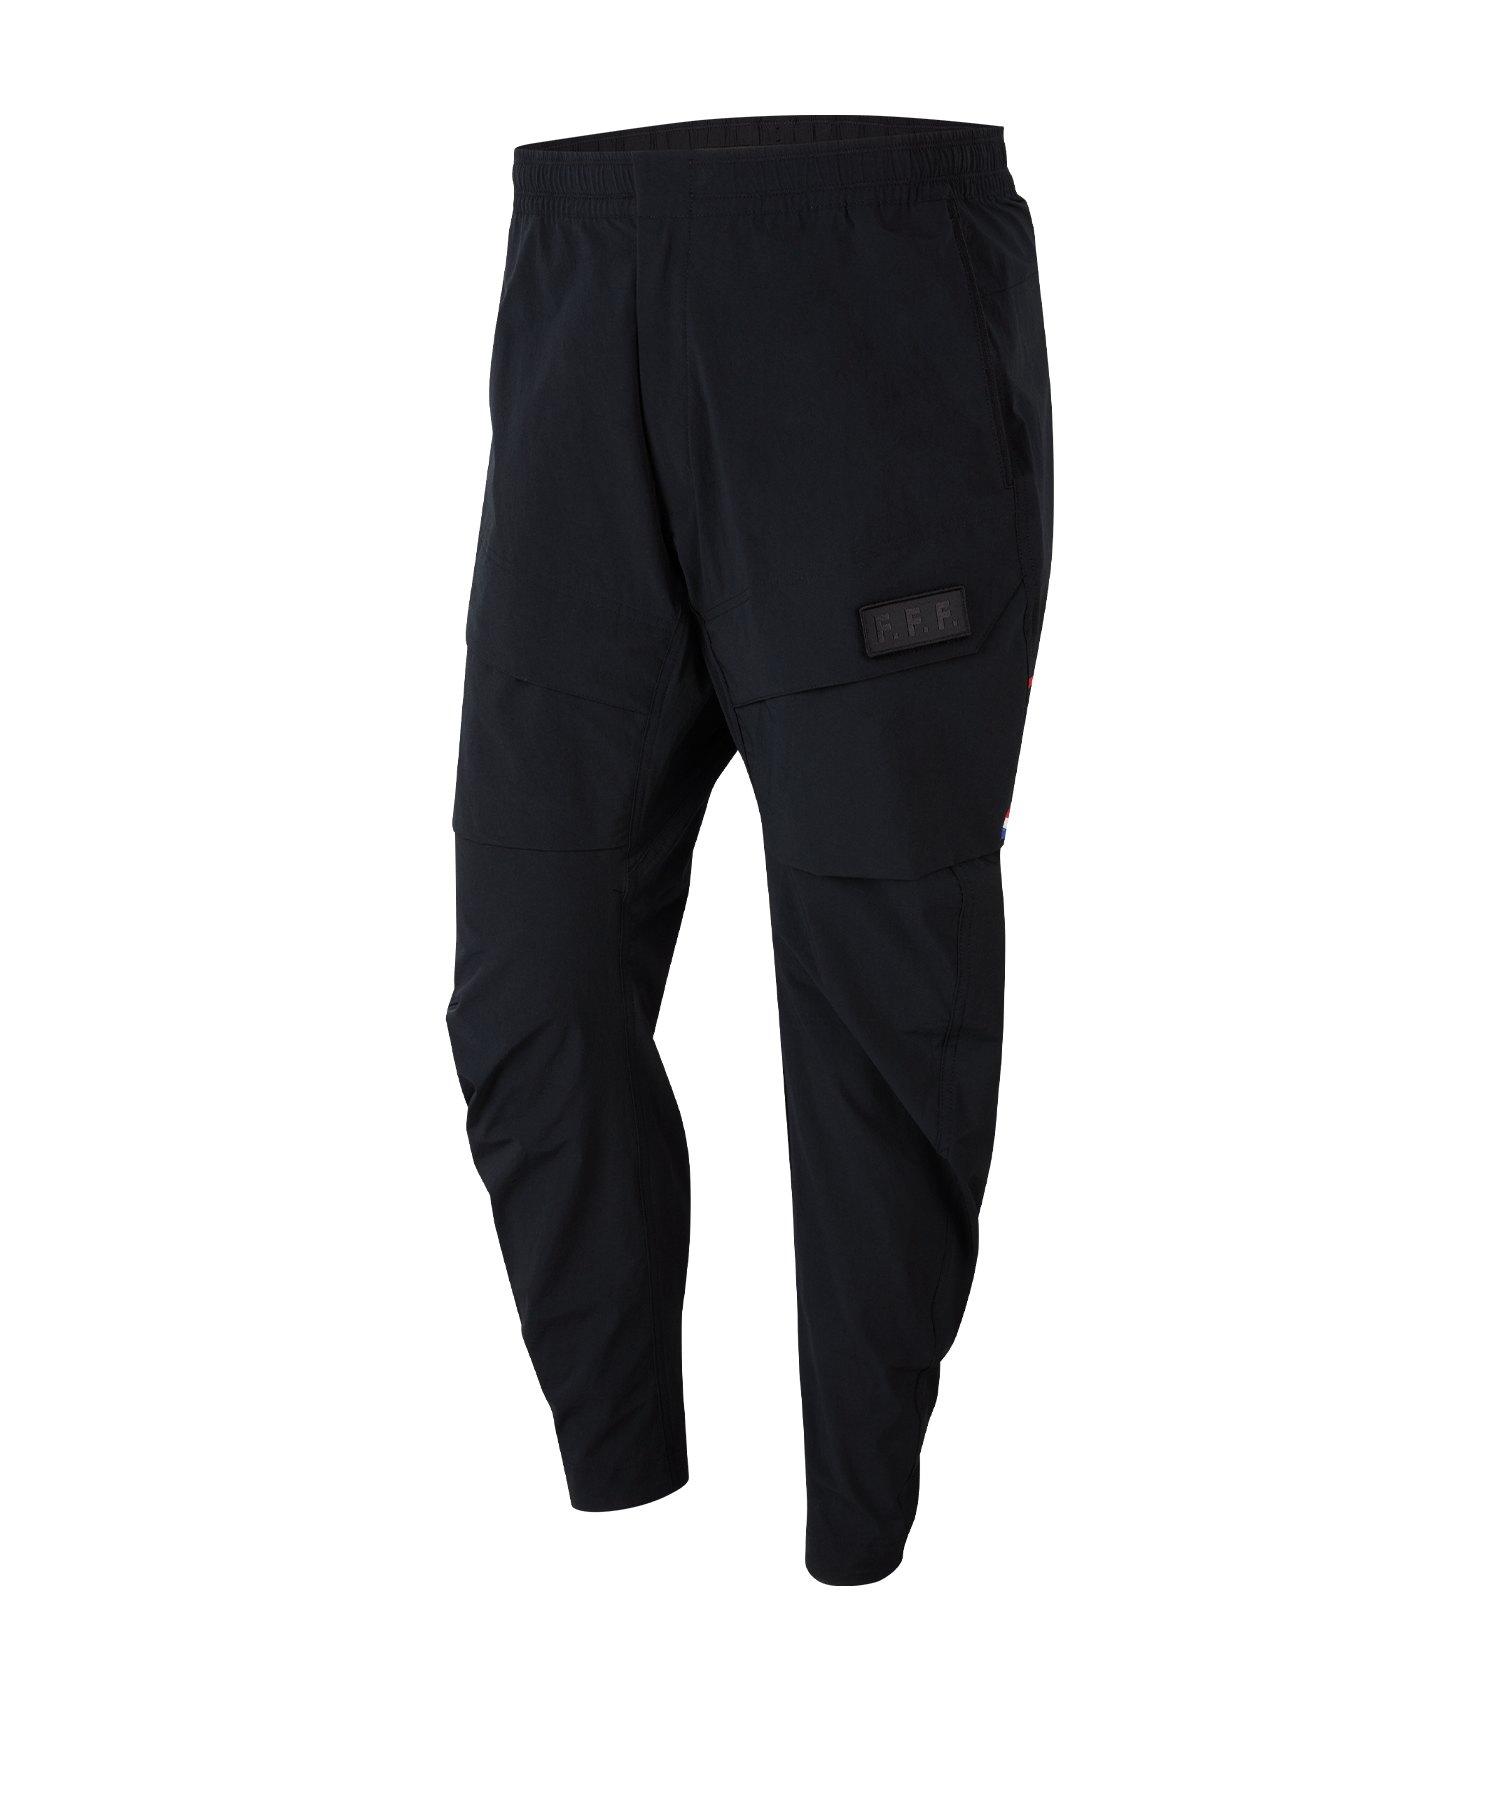 Nike Frankreich Woven Cargo Pant Hose F010 - schwarz